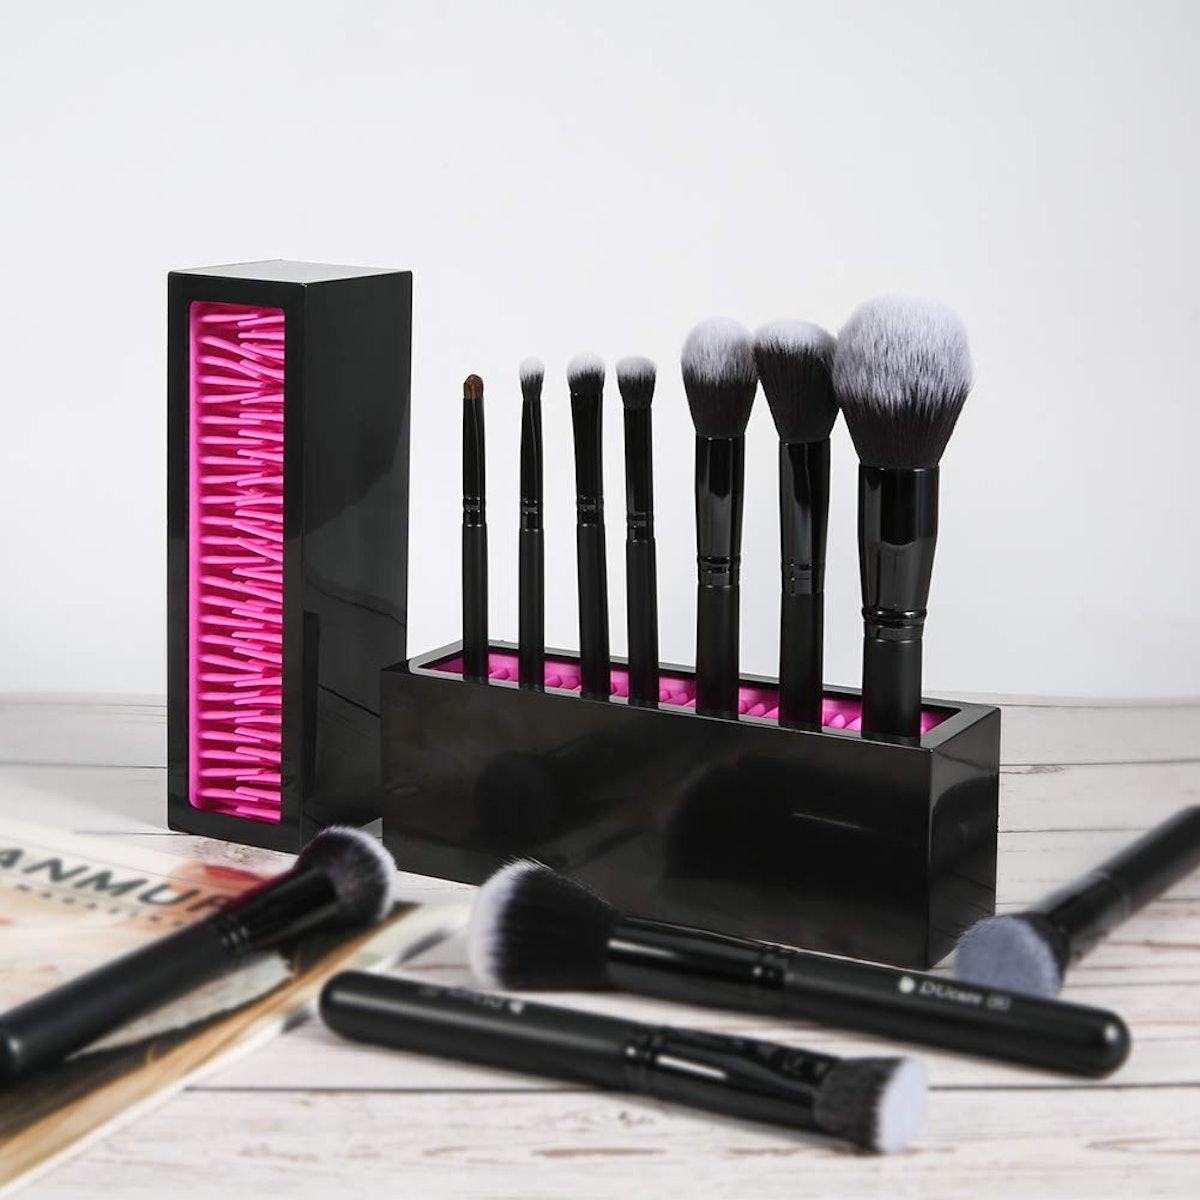 DUcare Makeup Brush Organizer